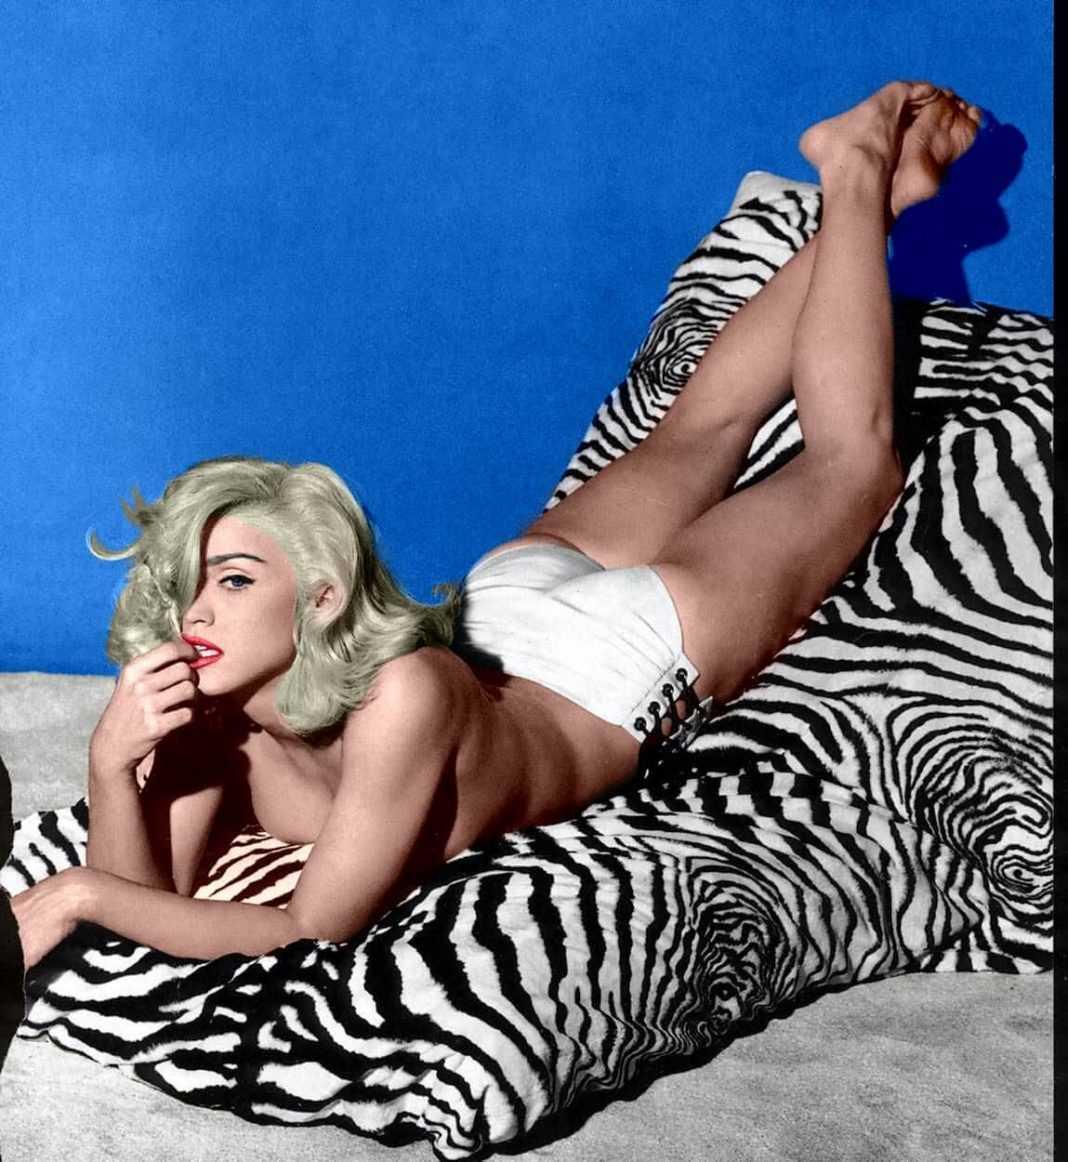 Madonna hot butt pic